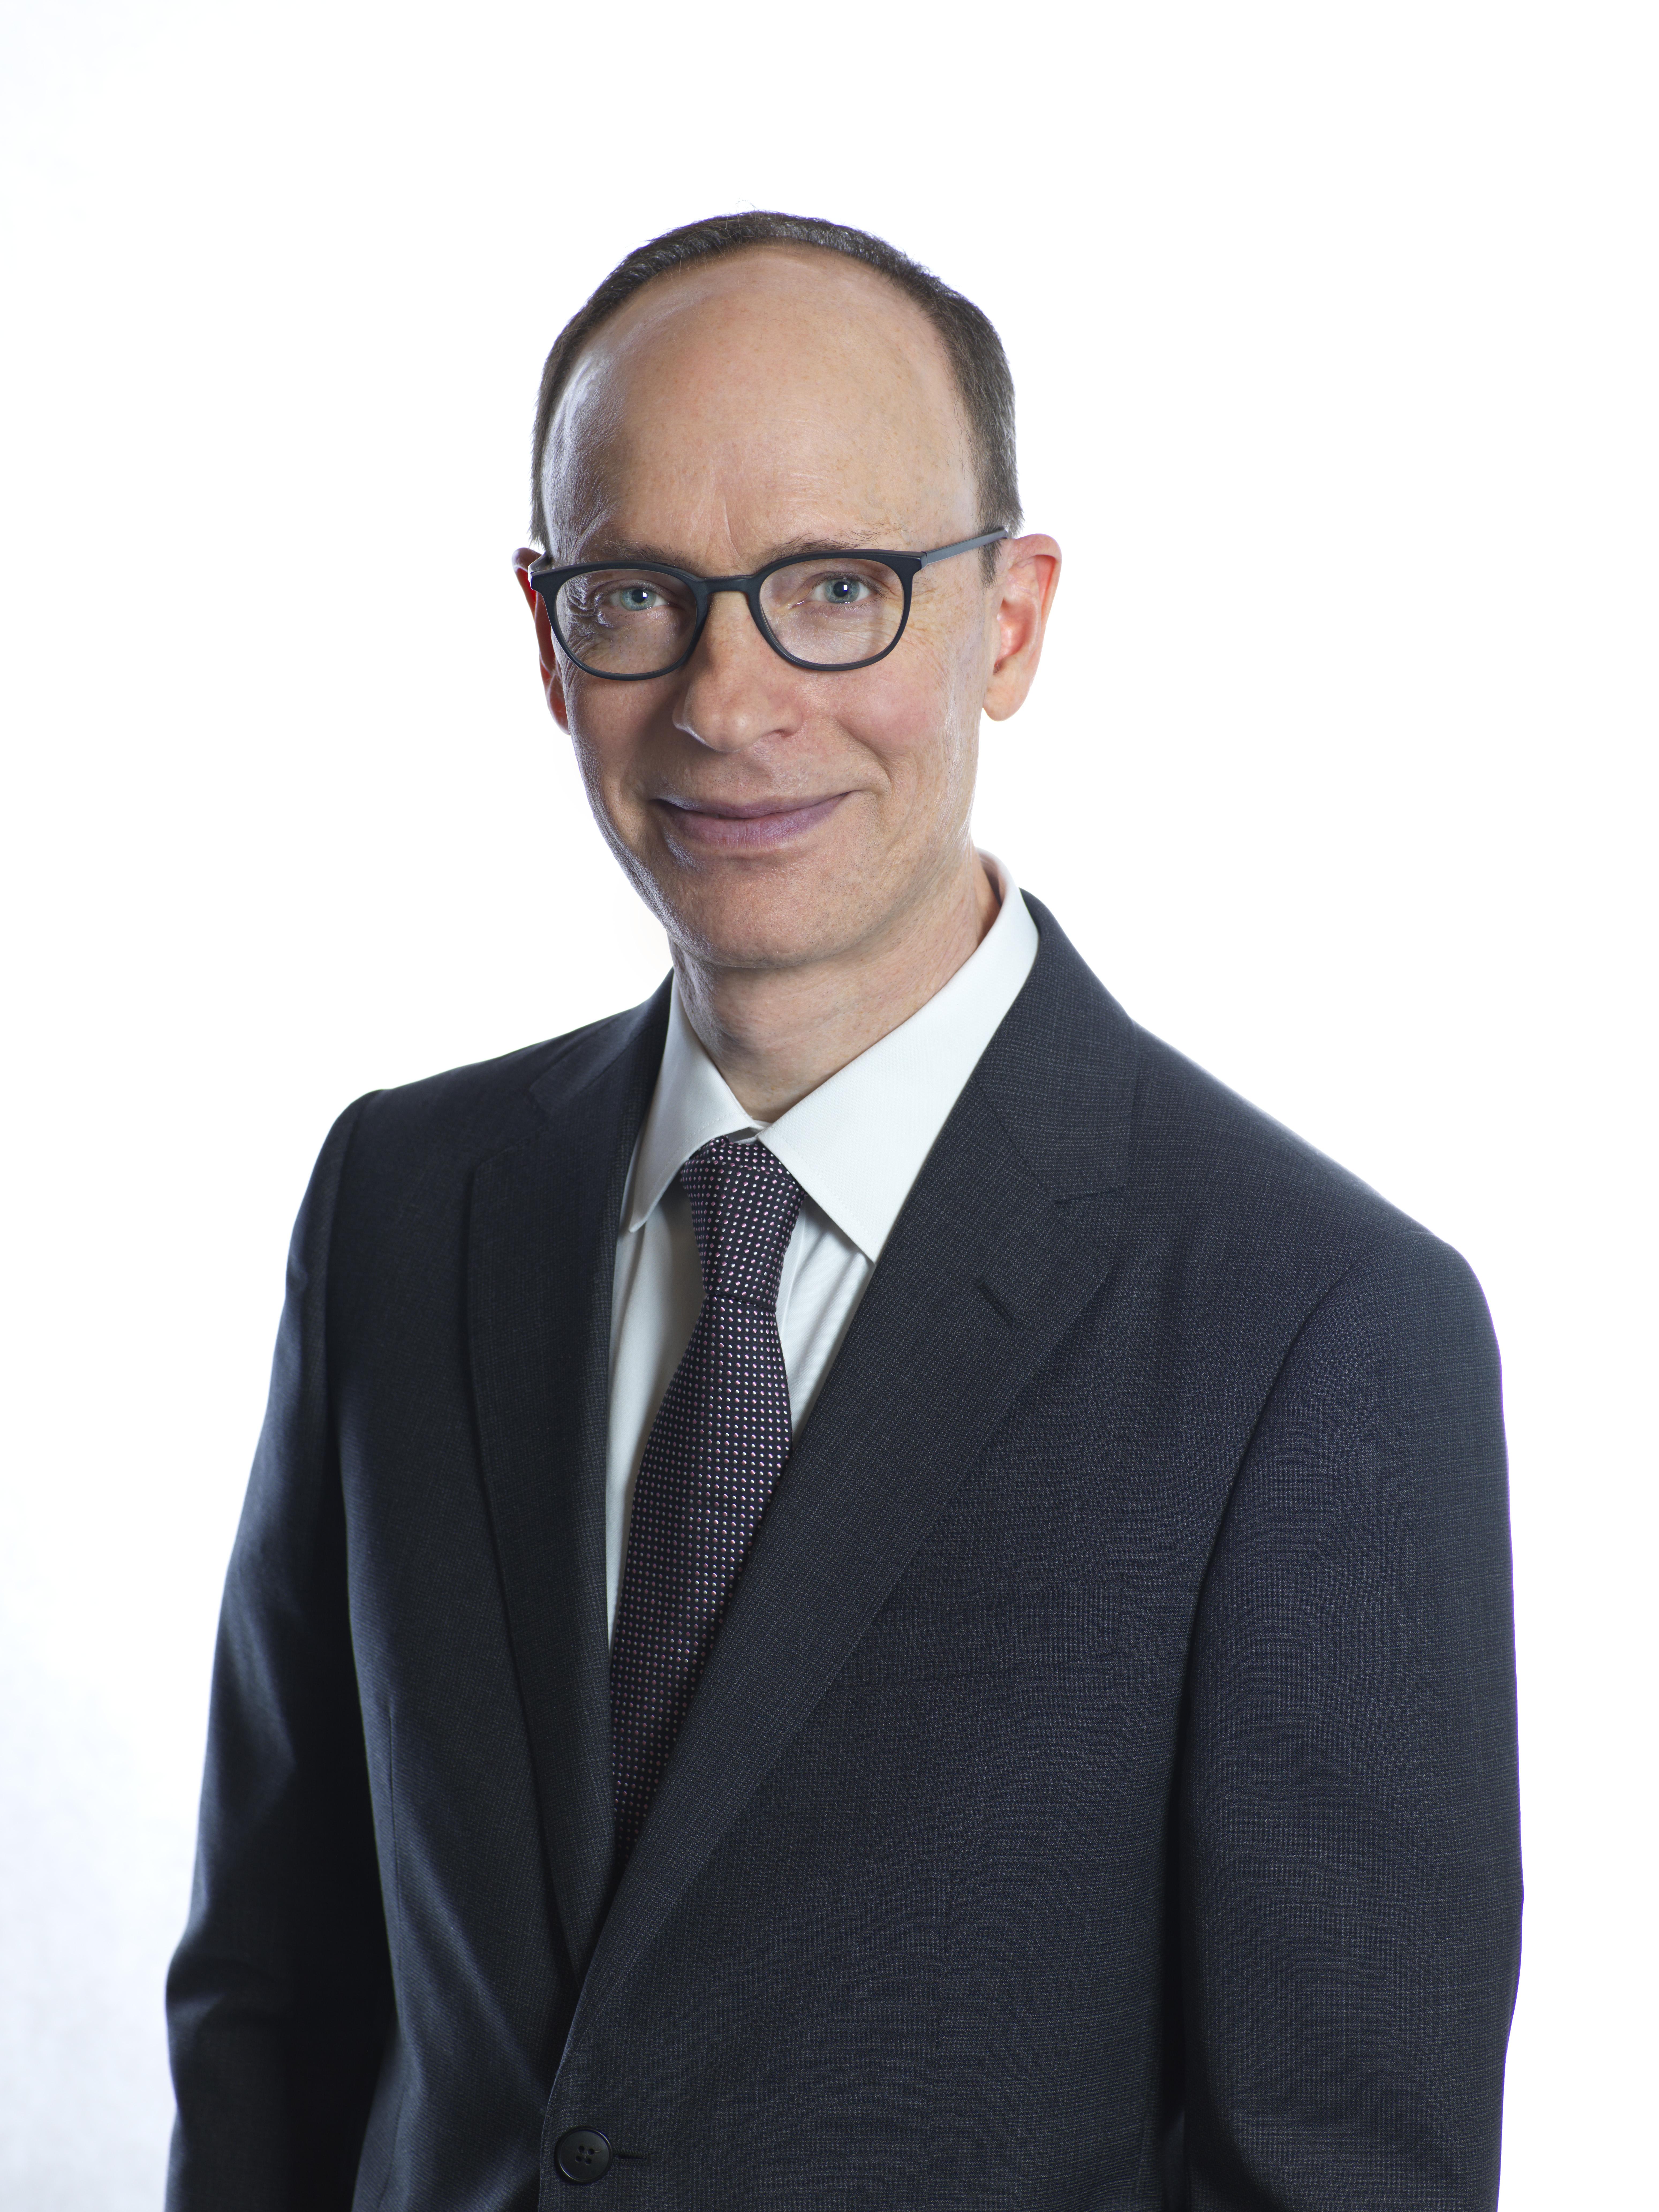 Olivier Fuldauer